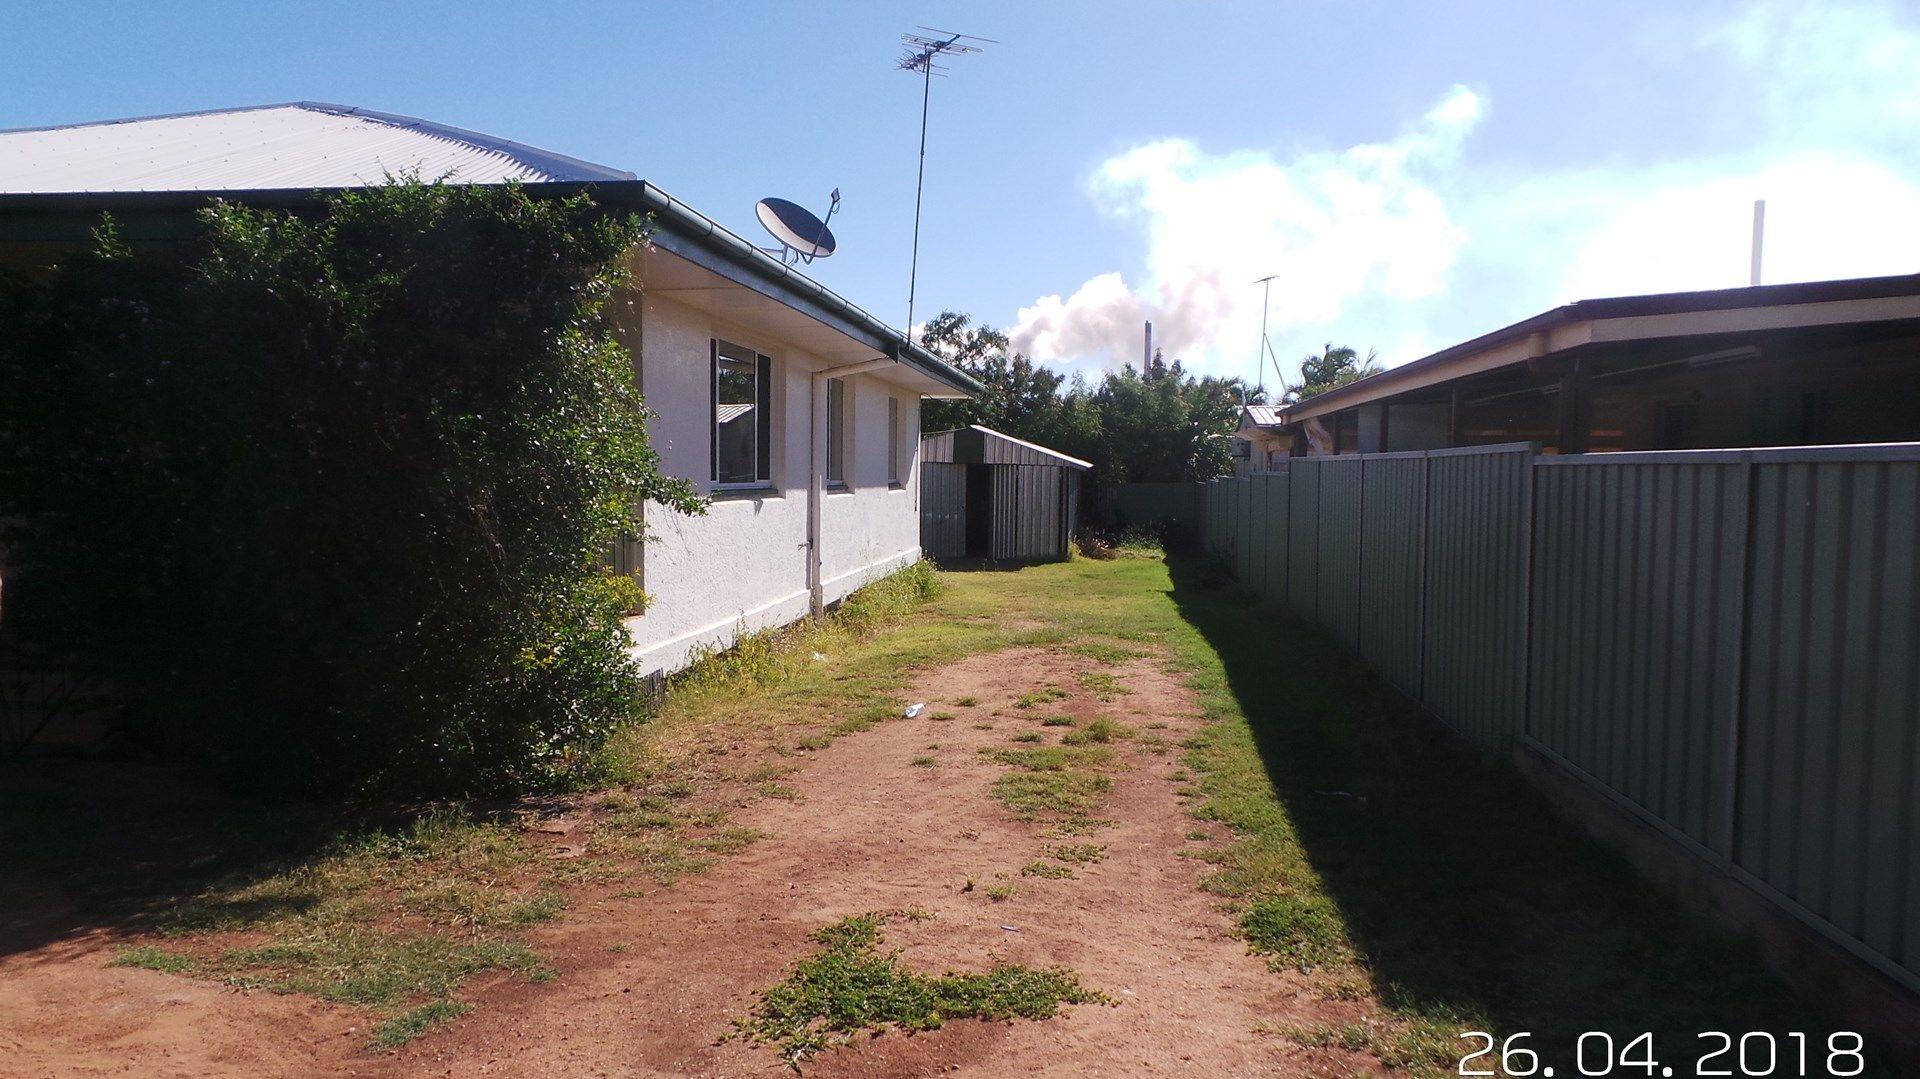 103 Kookaburra Street, Mount Isa QLD 4825, Image 0